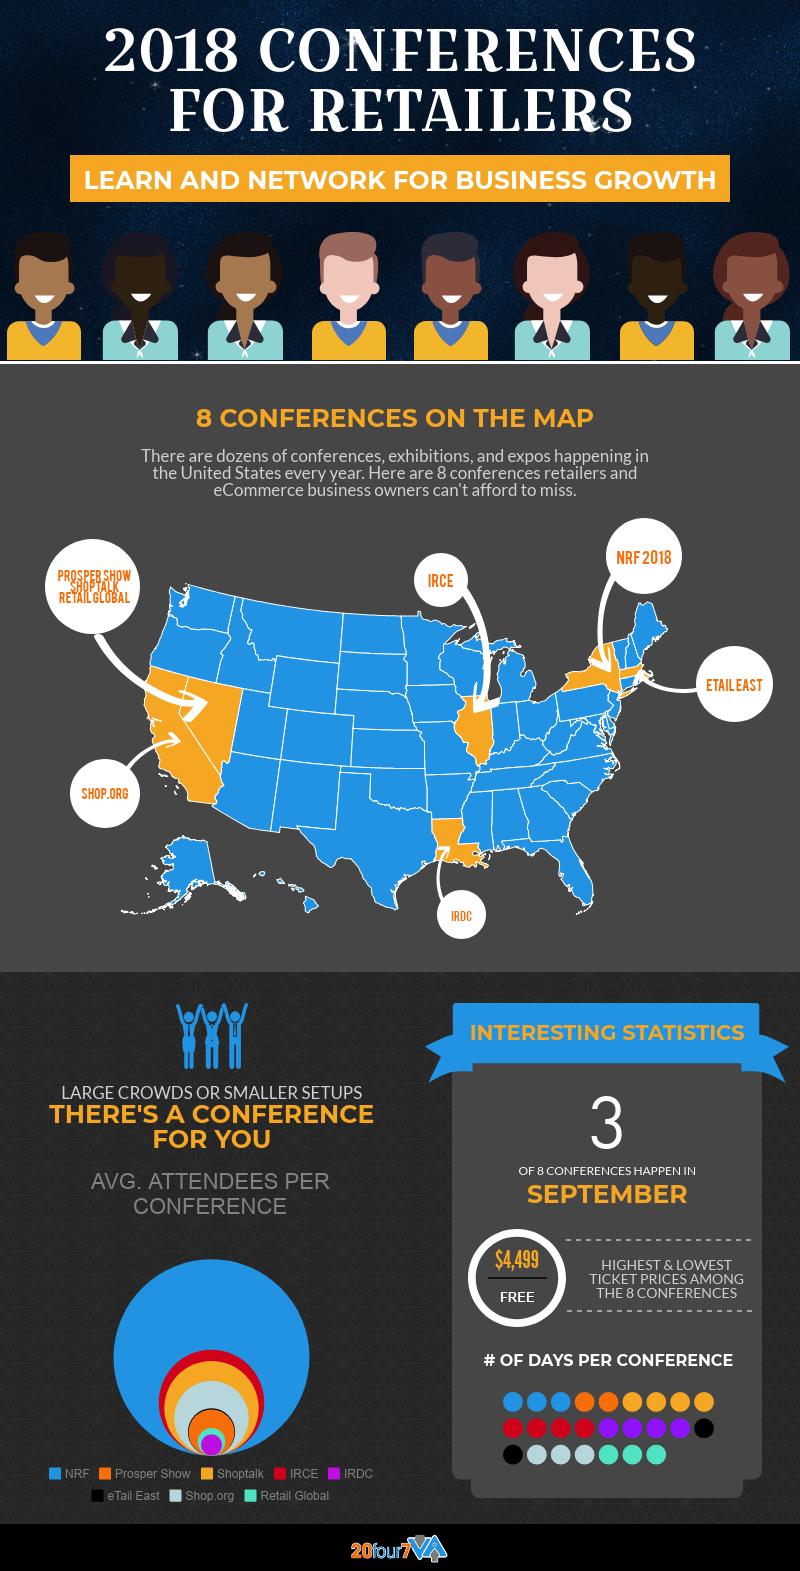 2018 Retail Conferences Infographic